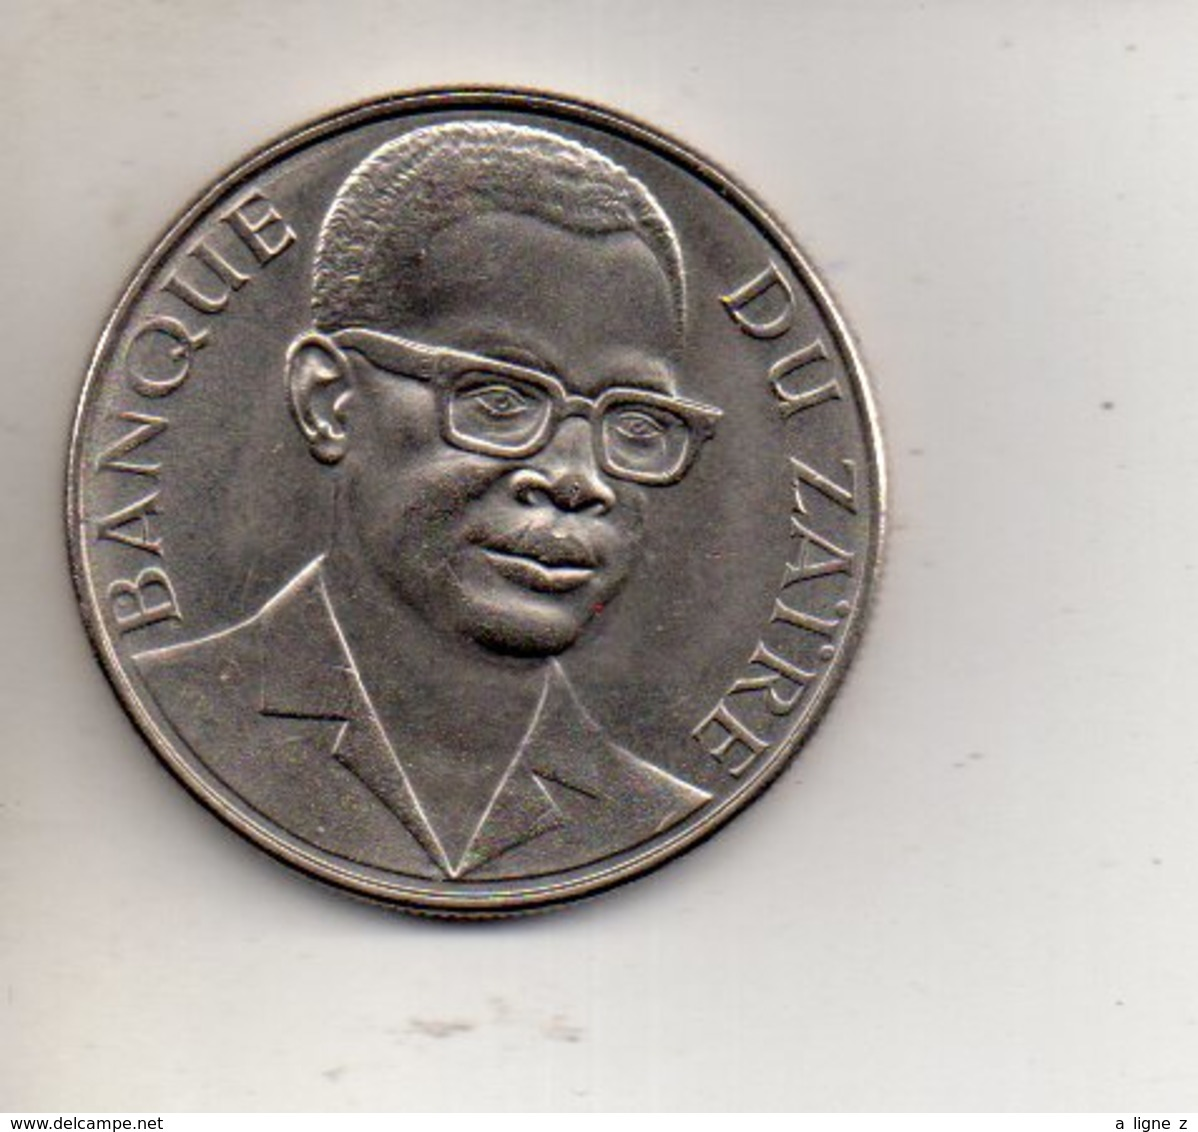 REF 1 : Monnaie Coin ZAIRE 1973 10 MAKUTA - Zaire (1971-97)